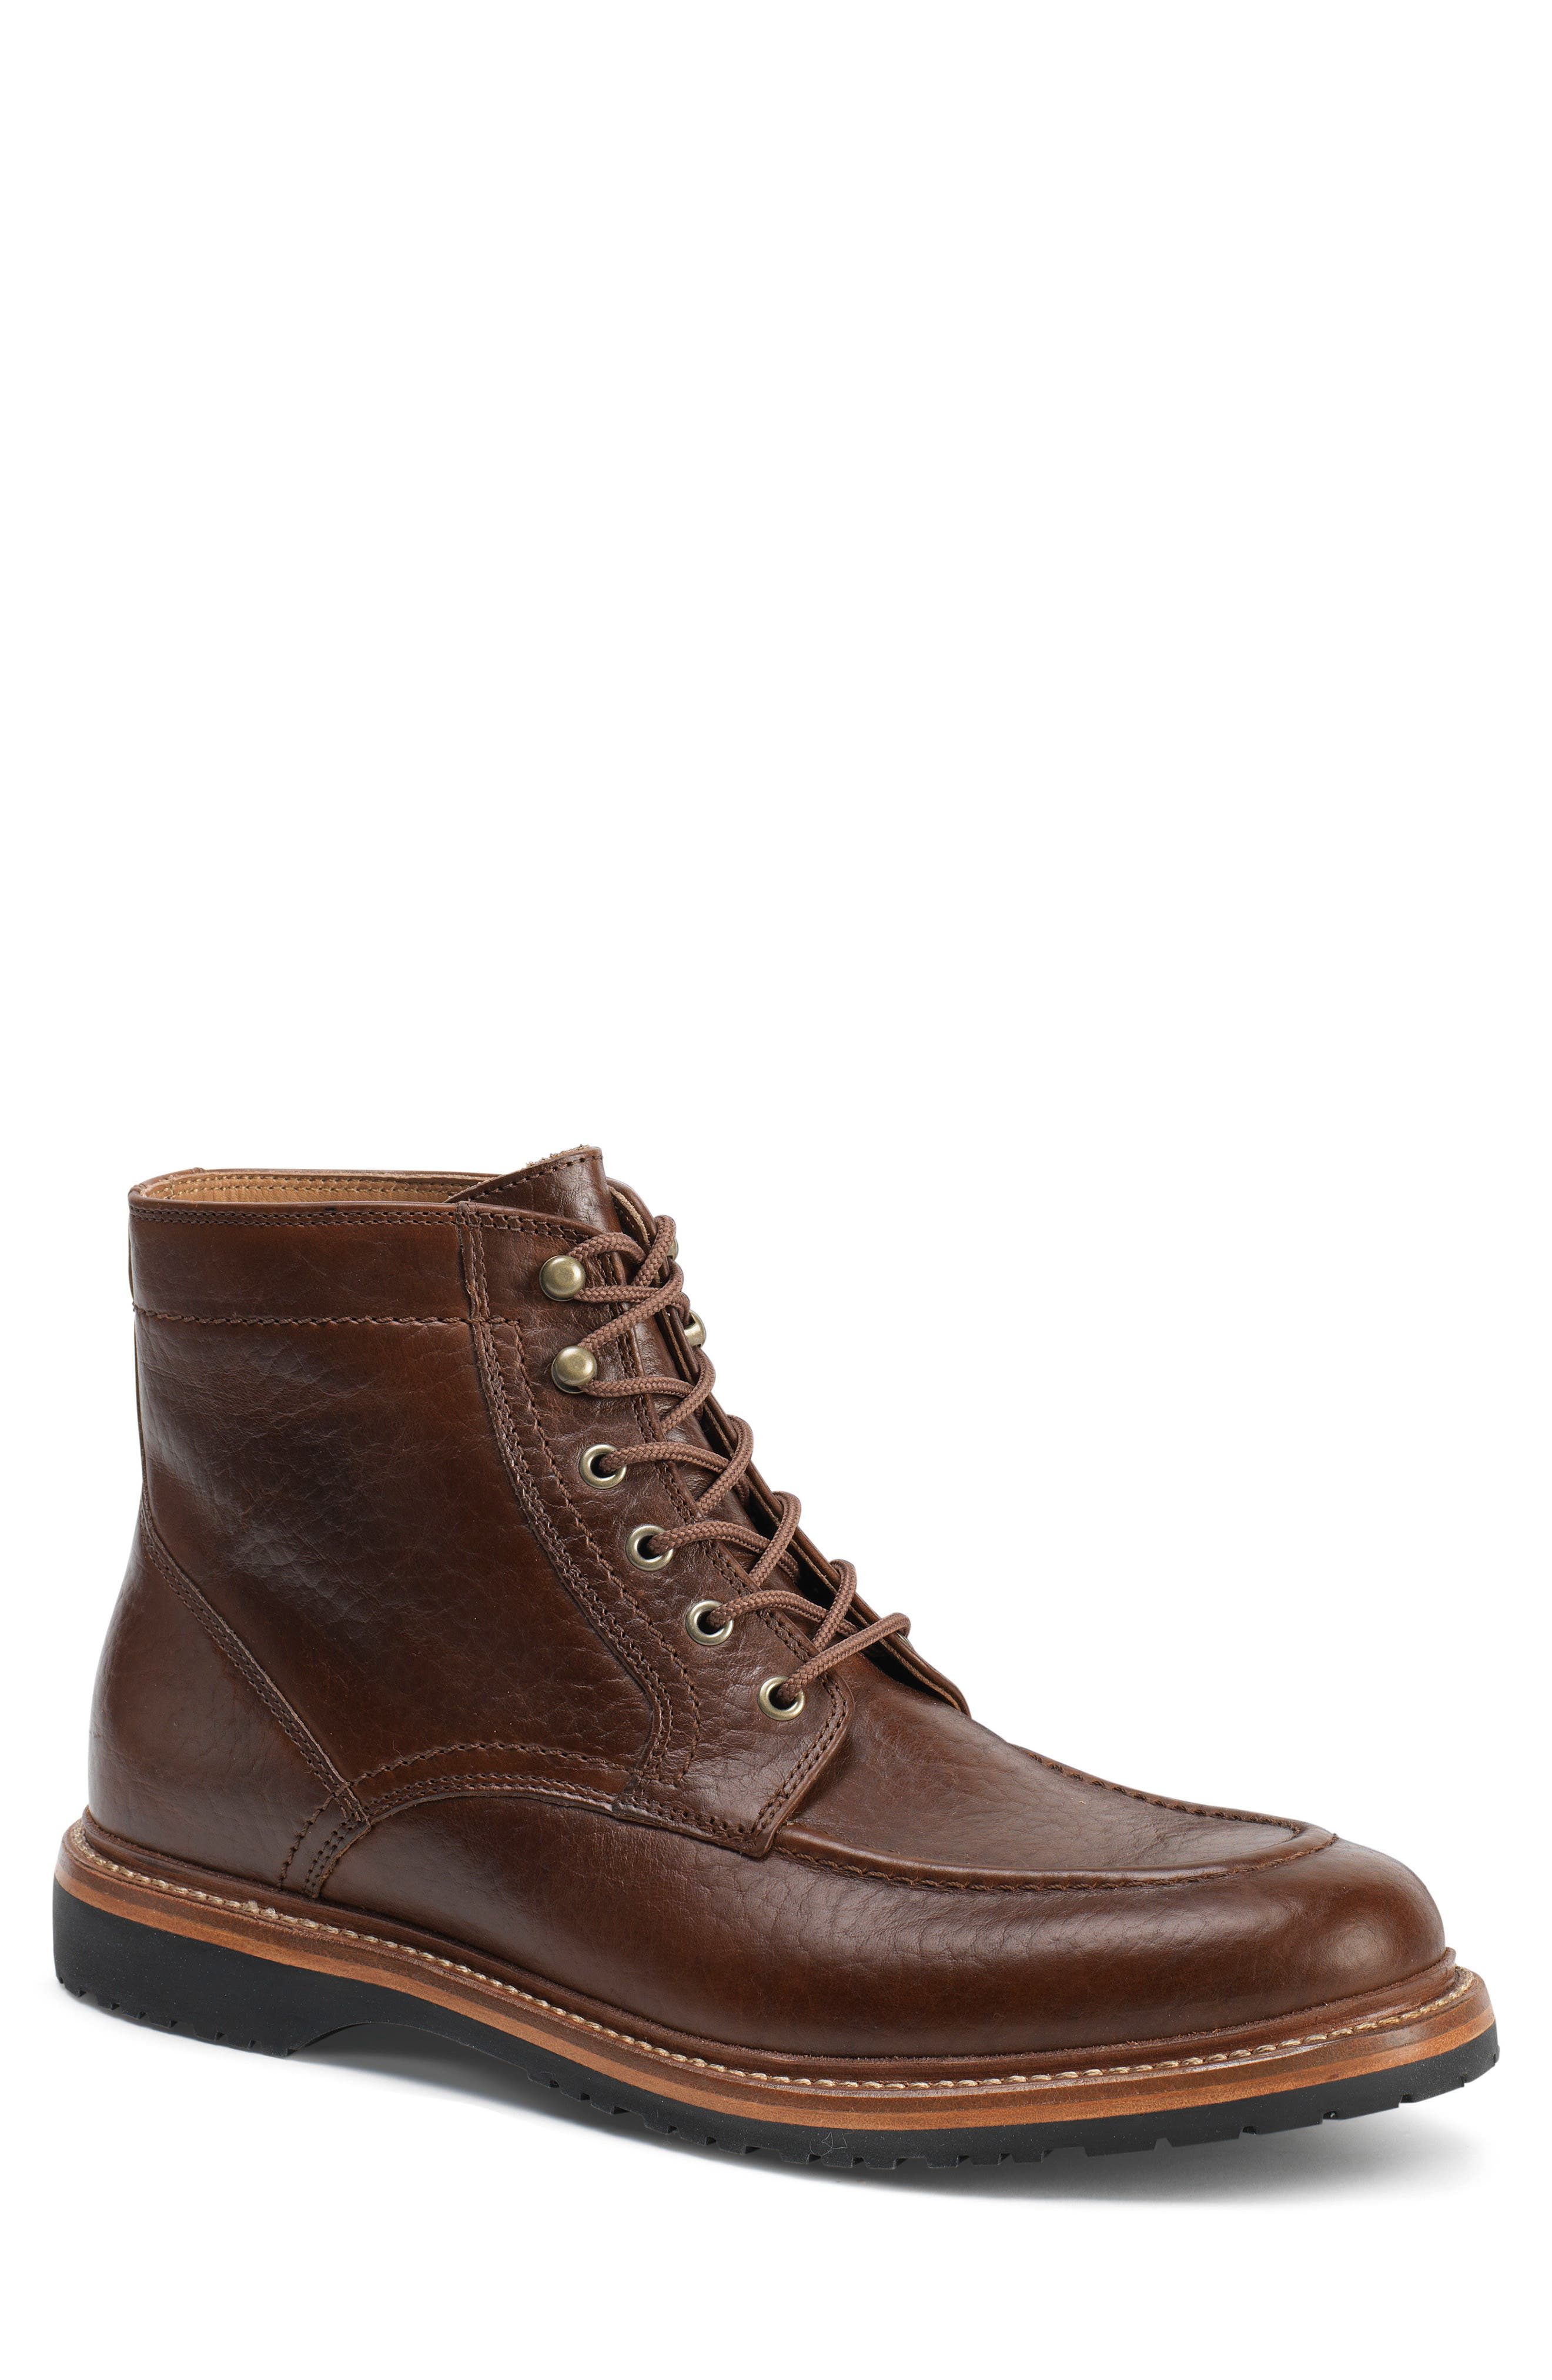 Alternate Image 1 Selected - Trask 'Andrew Mid' Apron Toe Boot (Men)